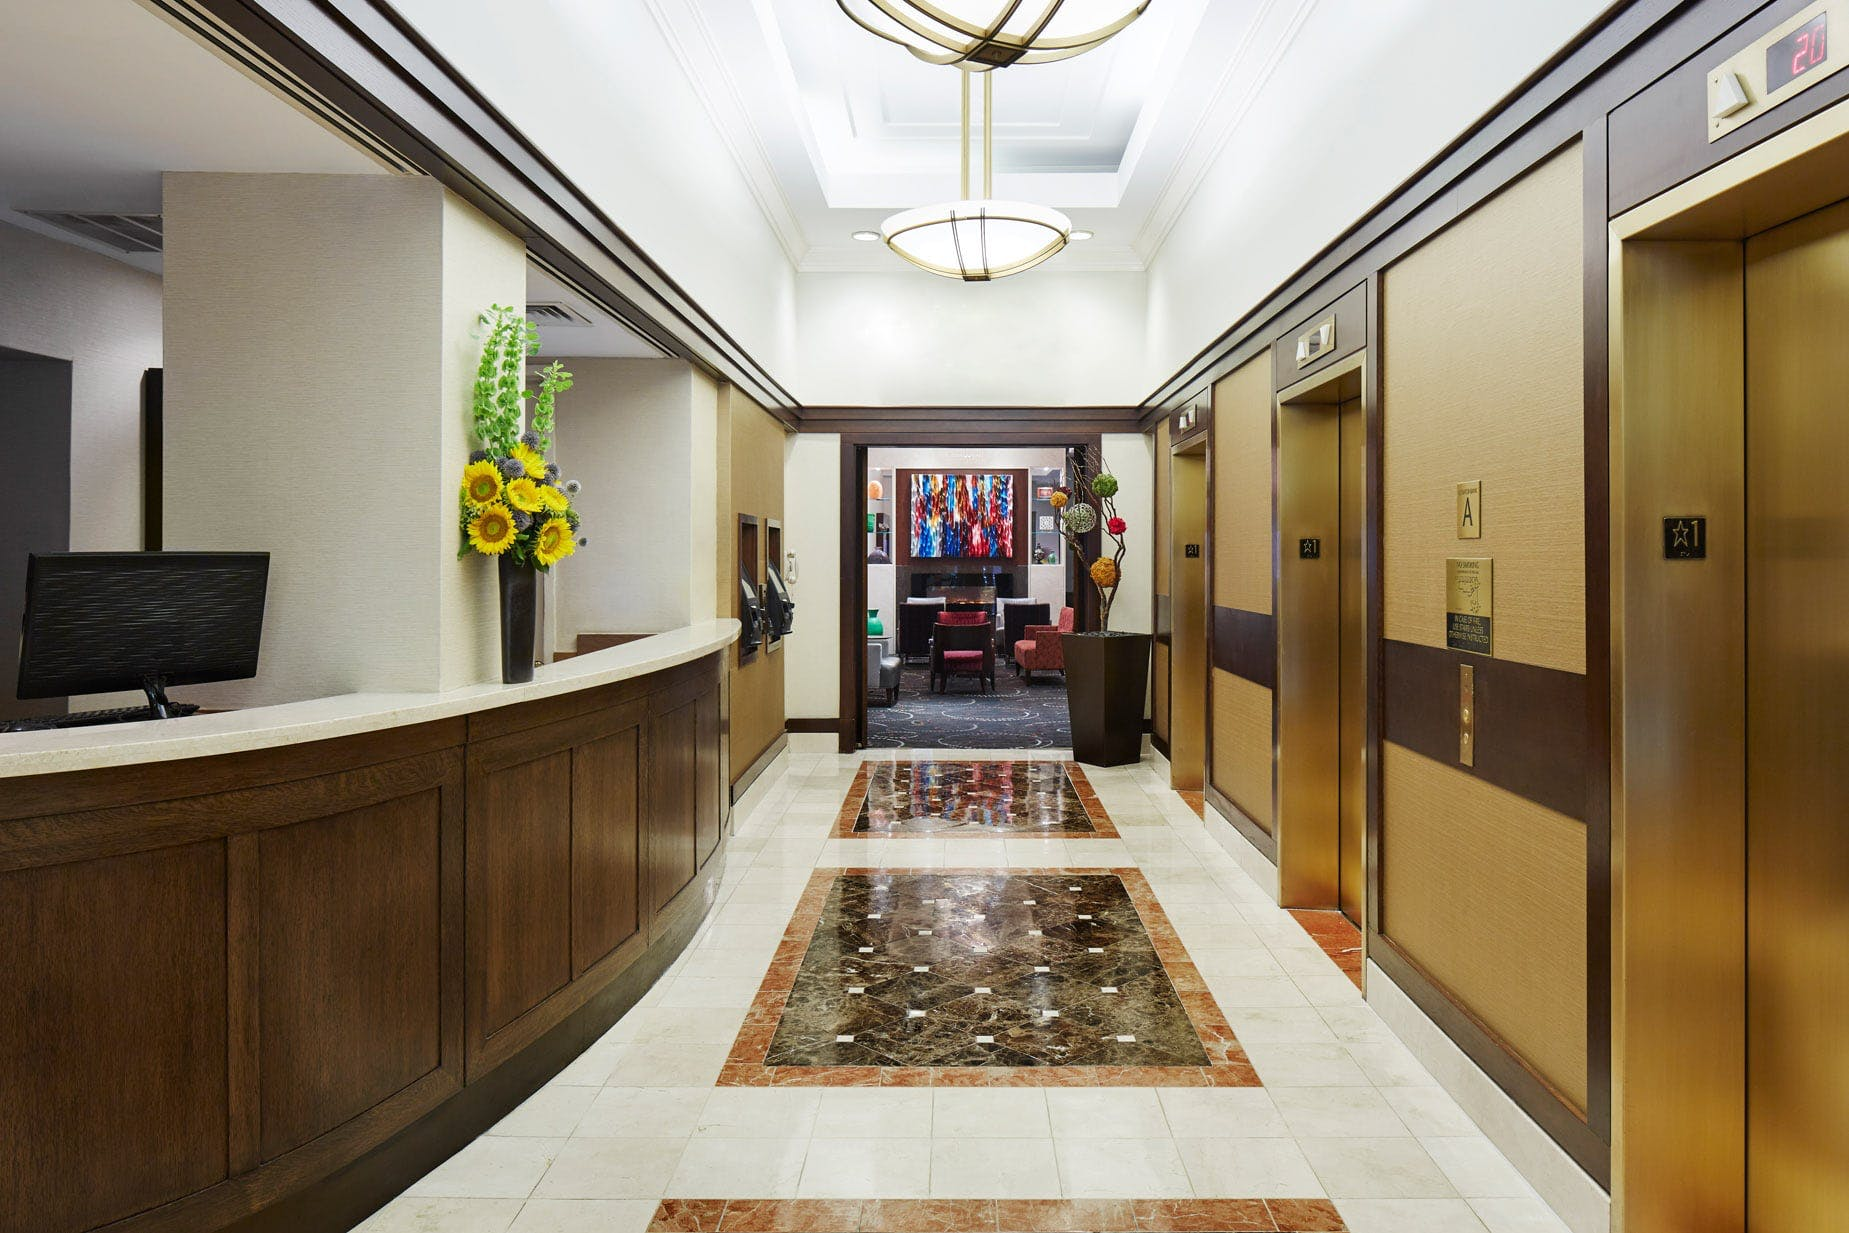 Lobby at Club Quarters Hotel, Wall Street